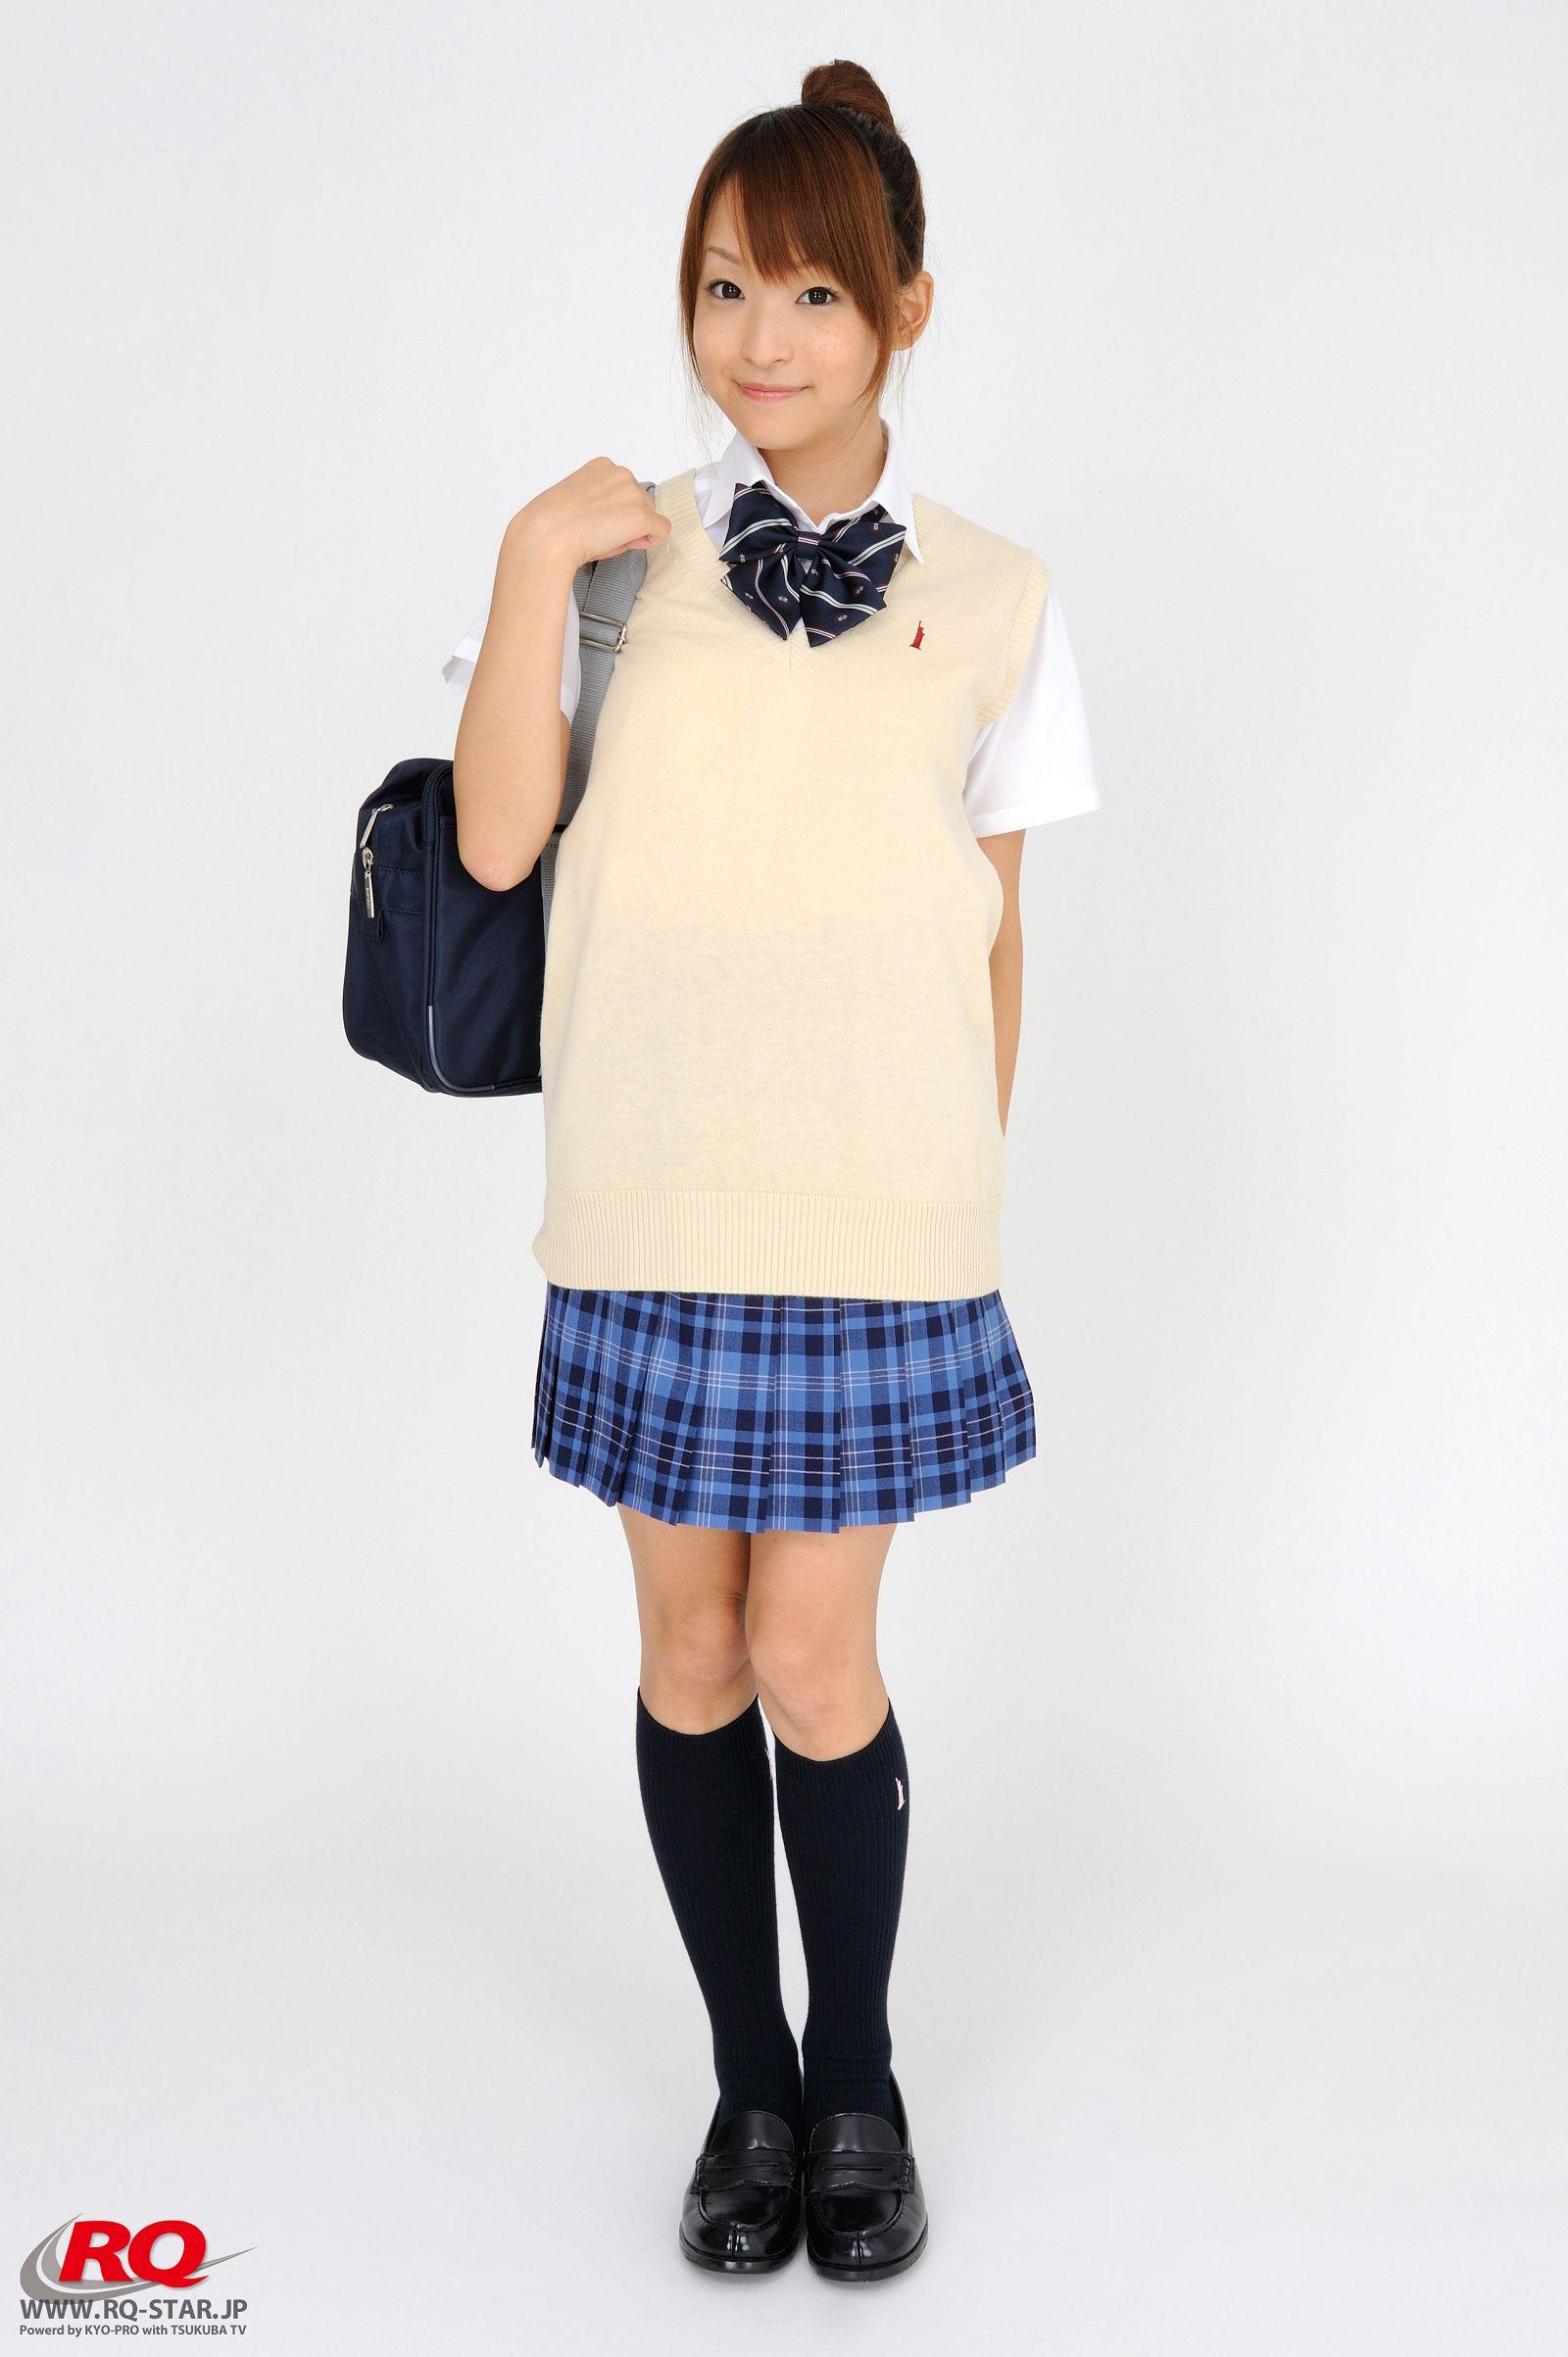 [RQ STAR美女] NO.0097 Mio Aoki 青木未央 Student Style[78P] RQ STAR 第1张